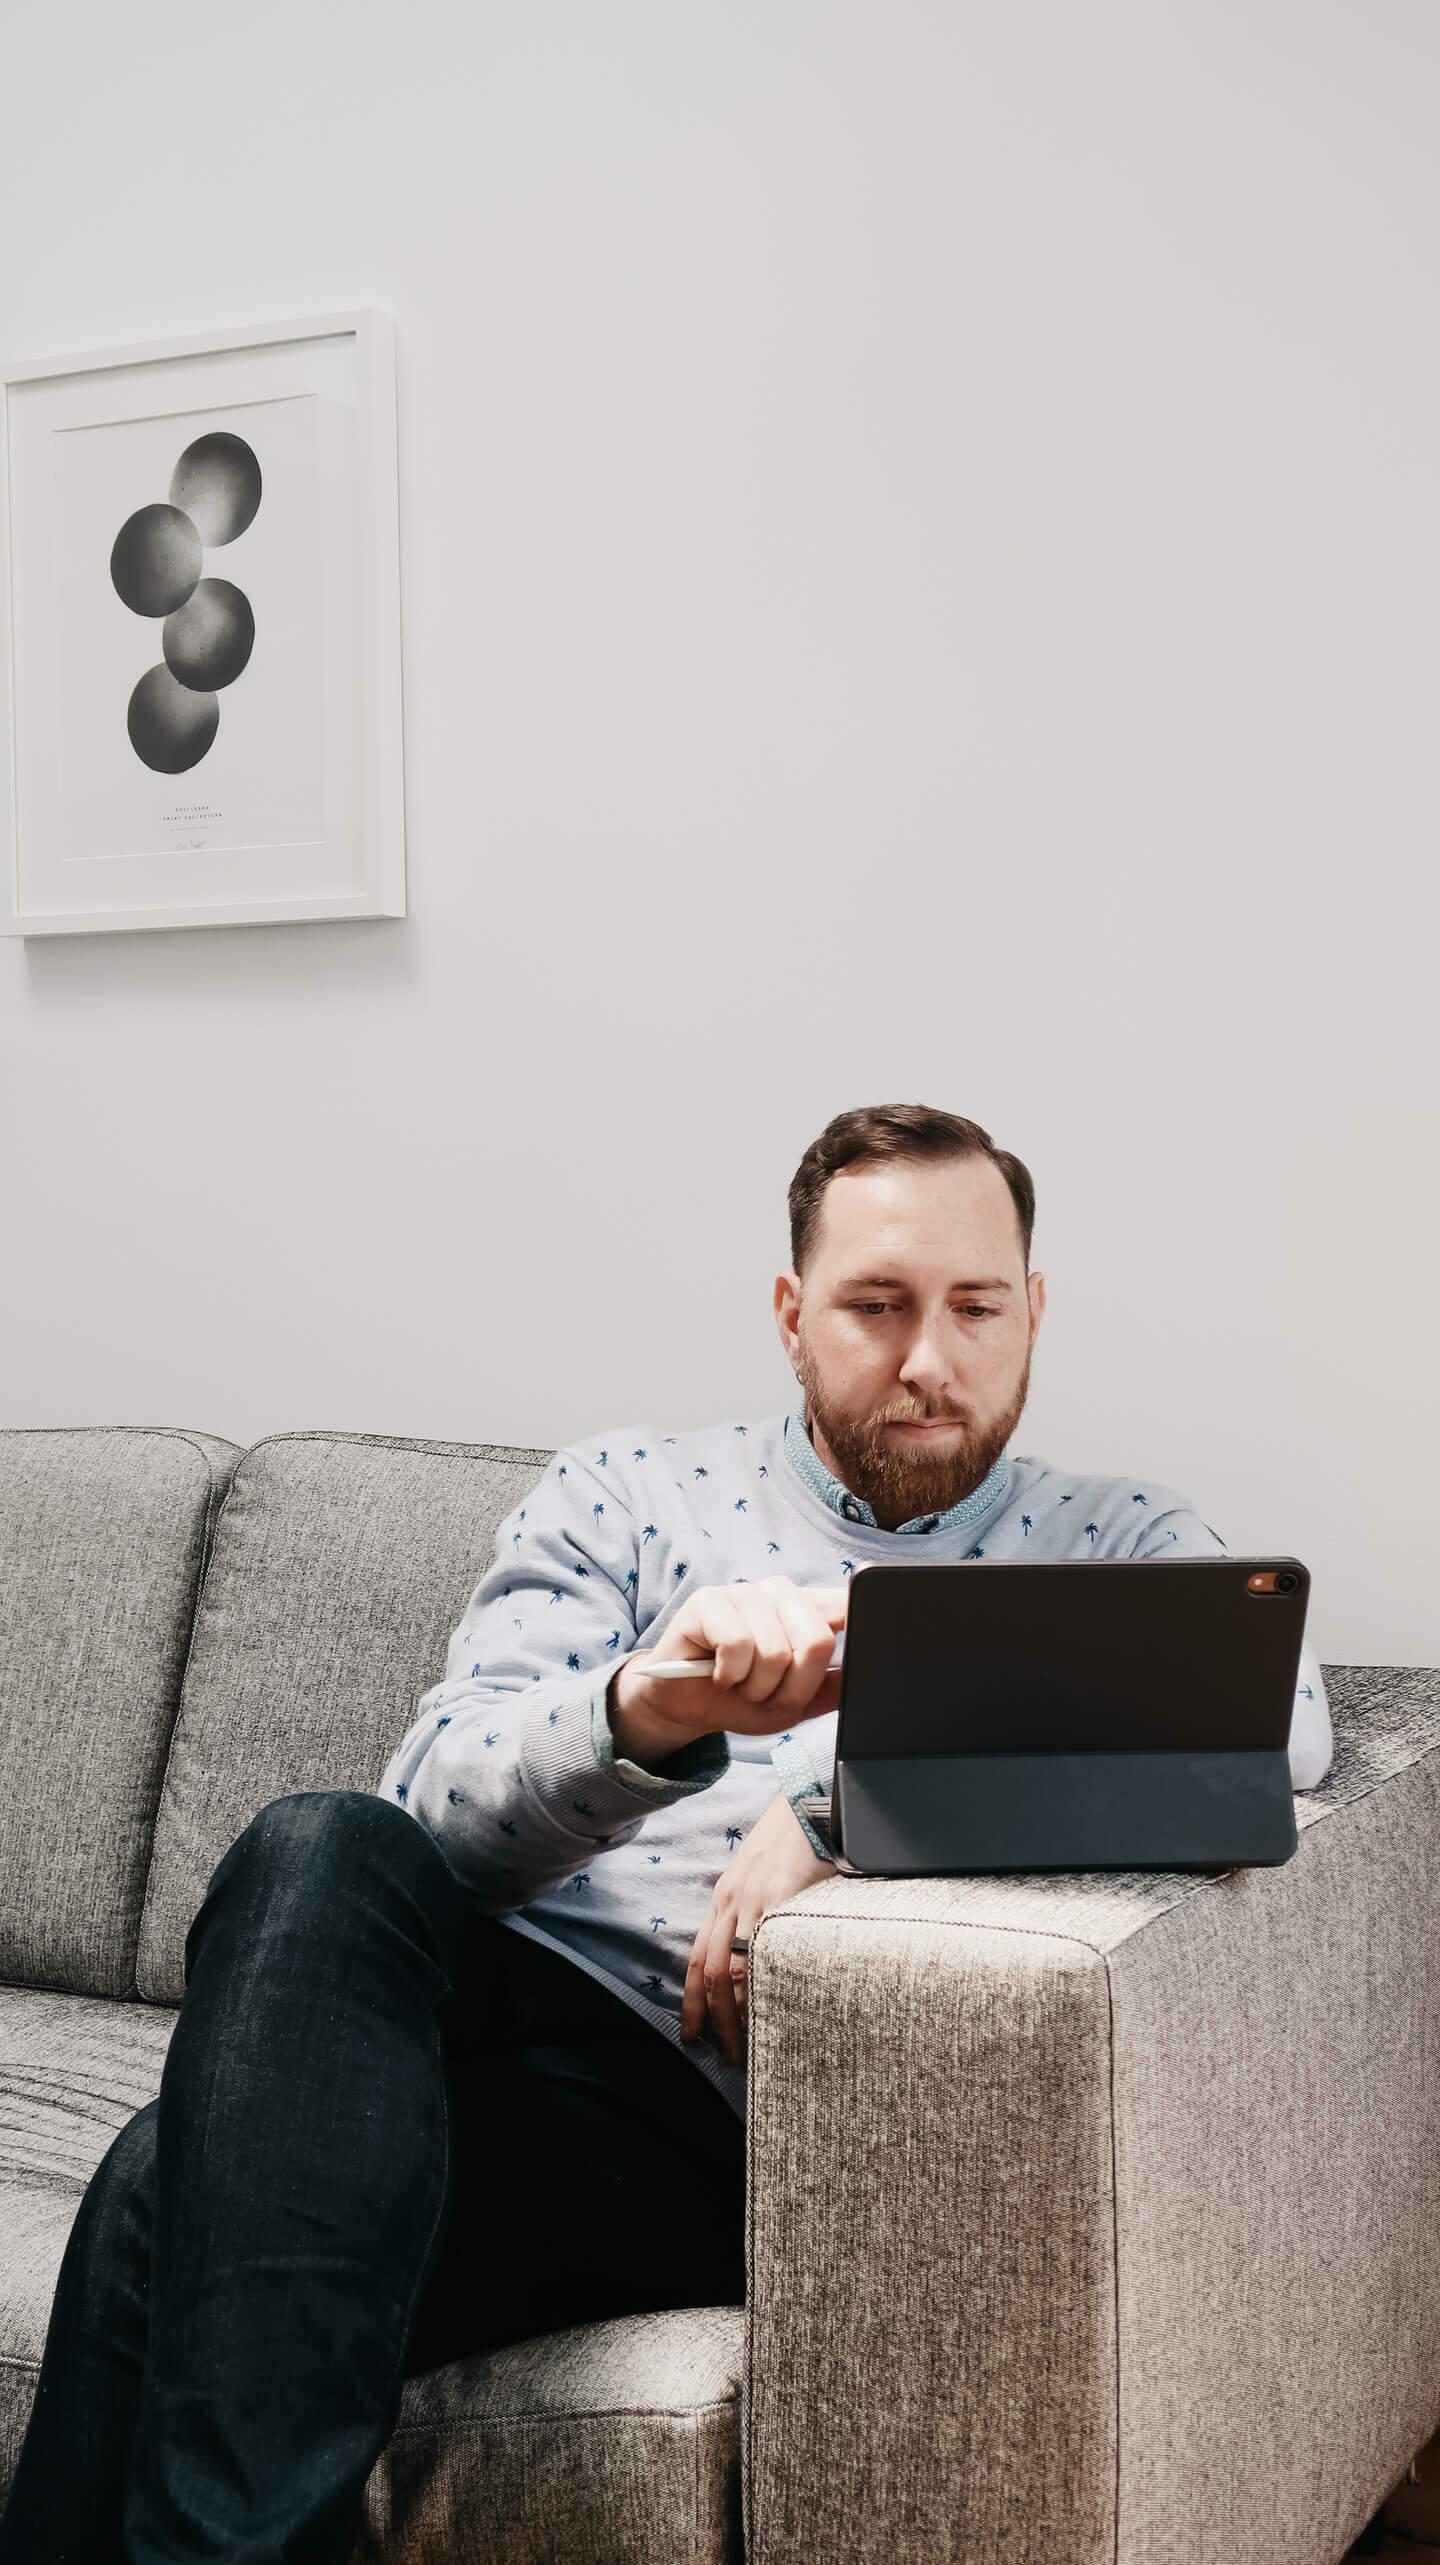 Man reading off of iPad.